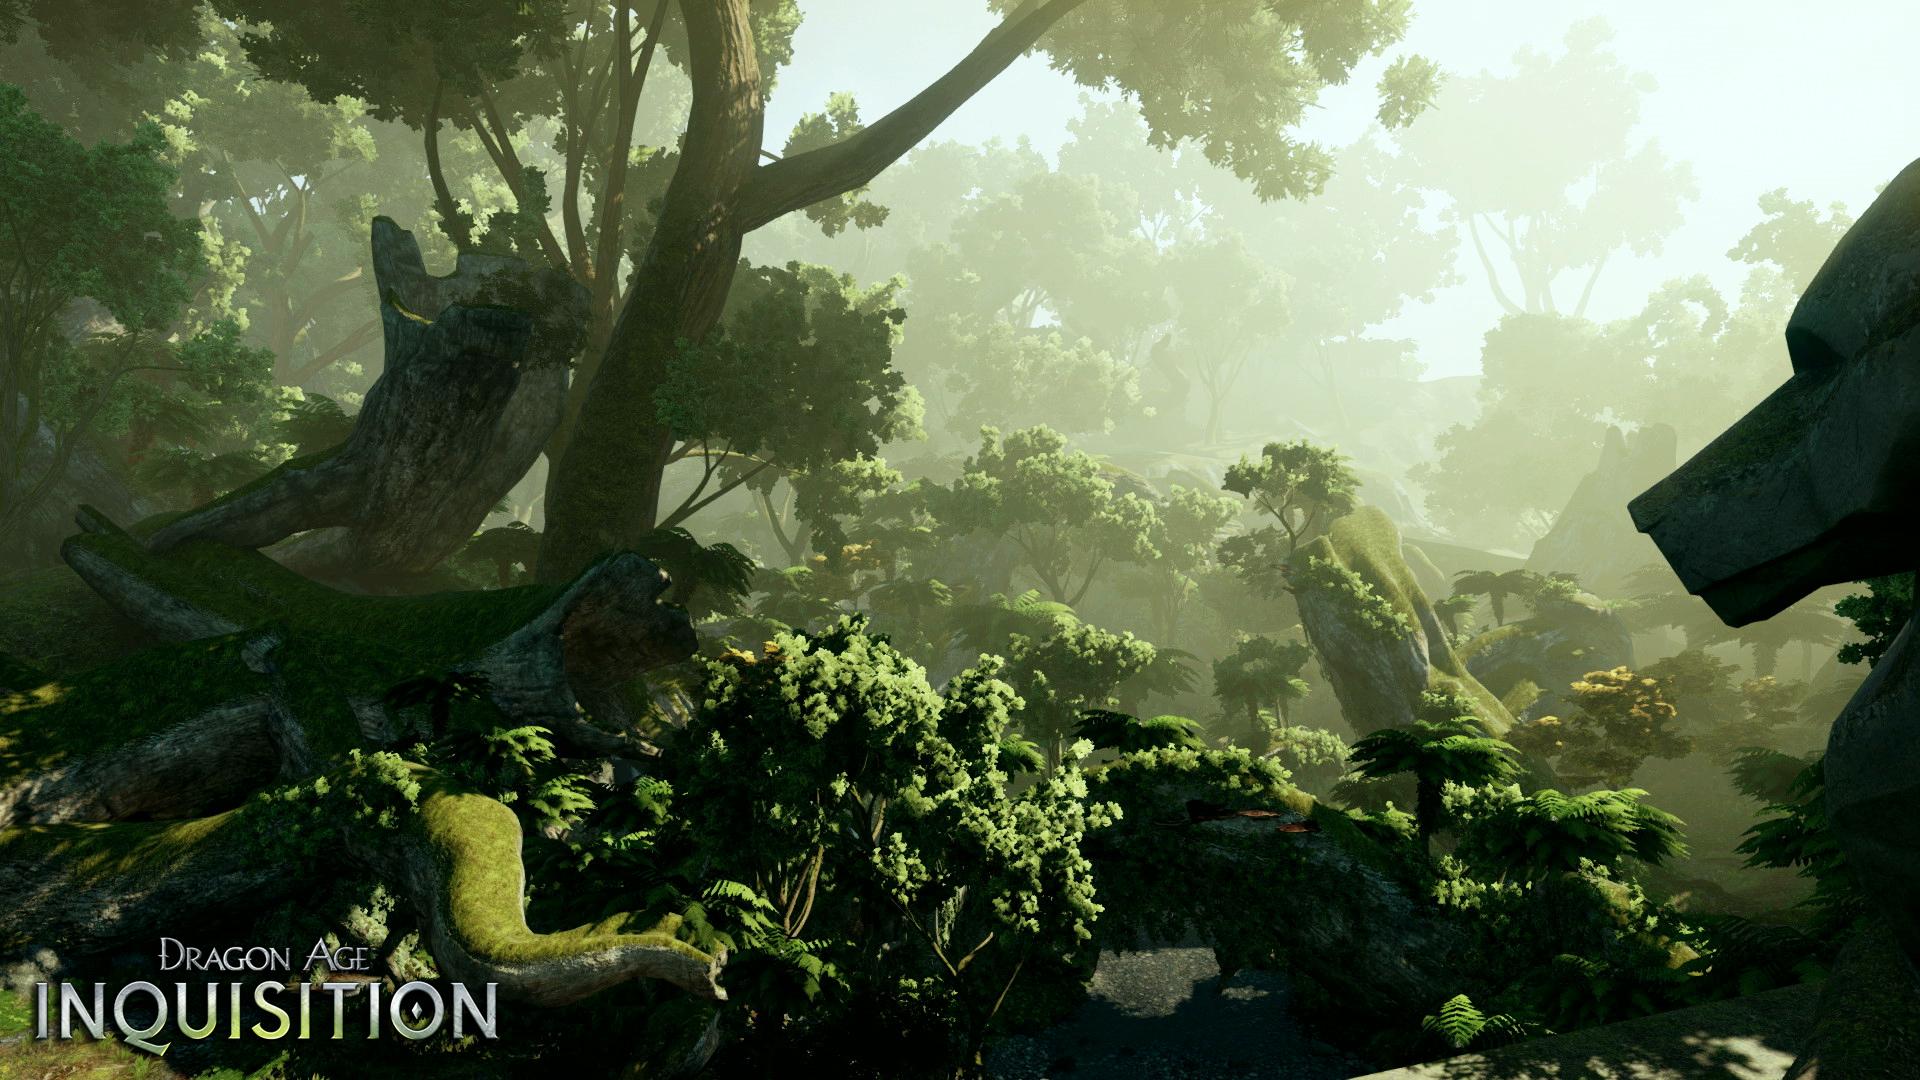 Imágenes De Dragon Age Inquisition Meristation